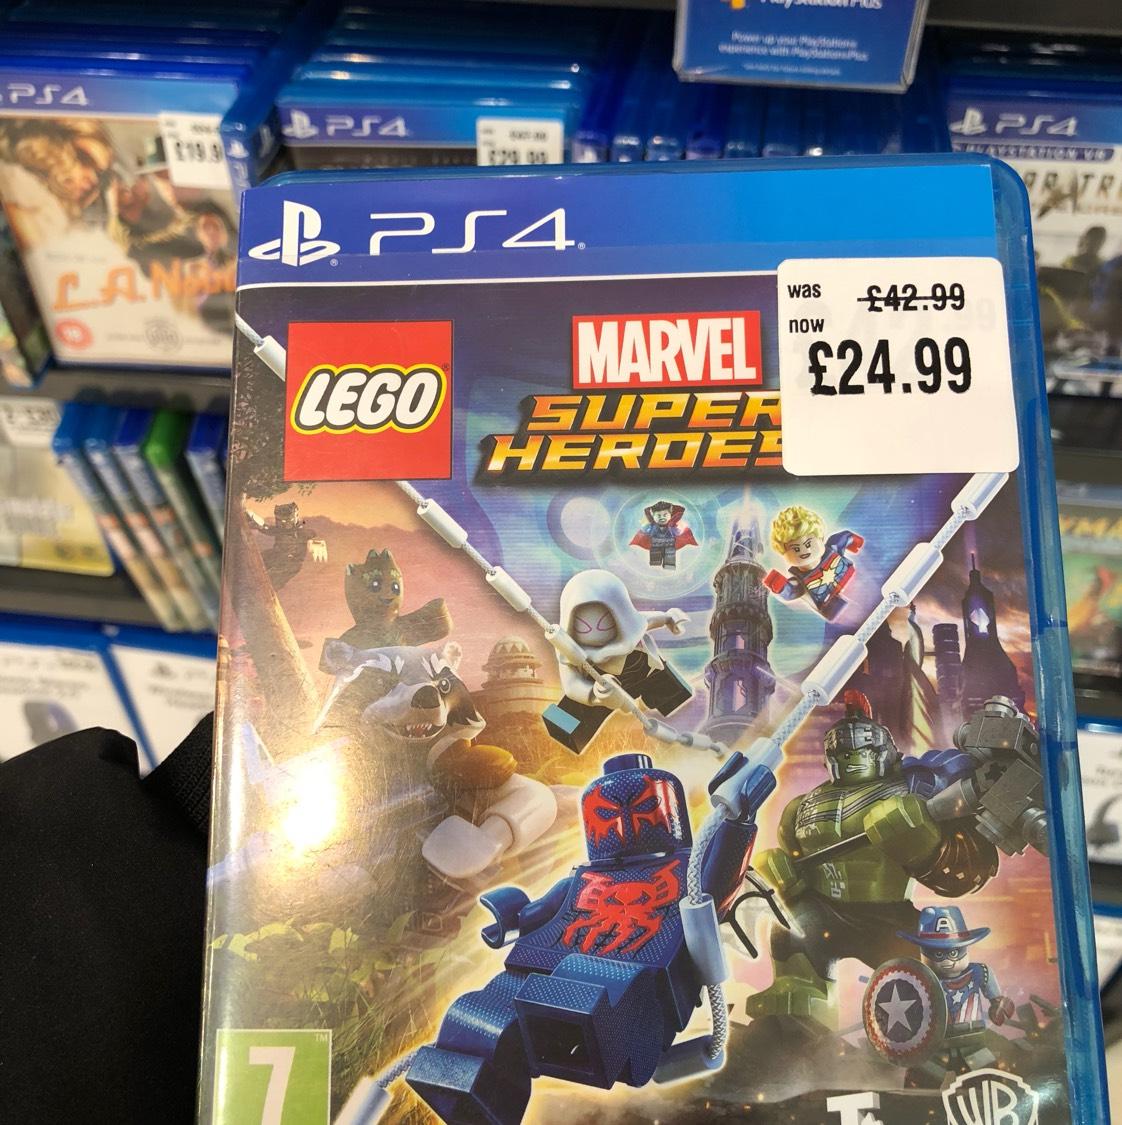 Marvel Lego super heroes 2 ps4/Xbox £24.99 @ hmv